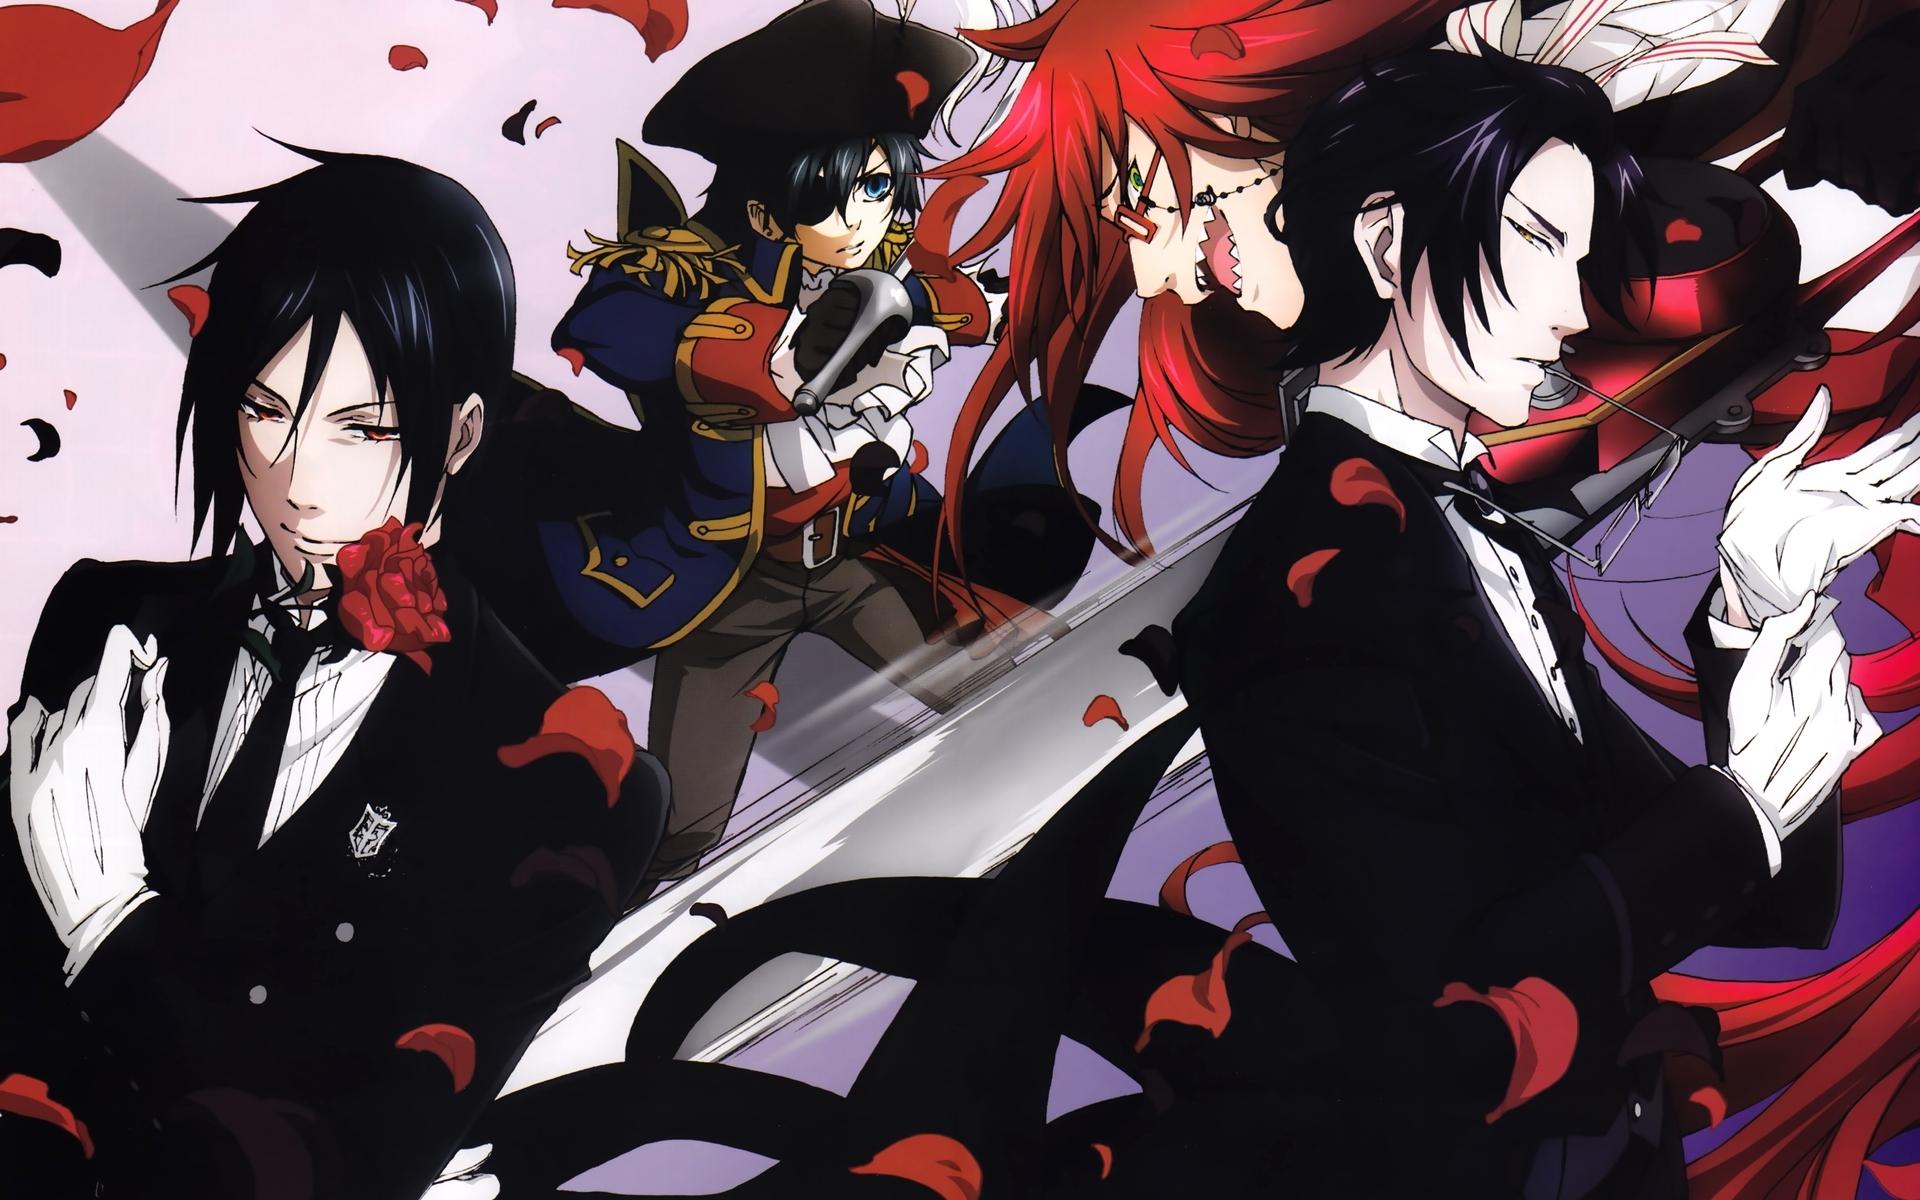 Black butler full hd wallpaper and background image - Anime wallpaper black background ...